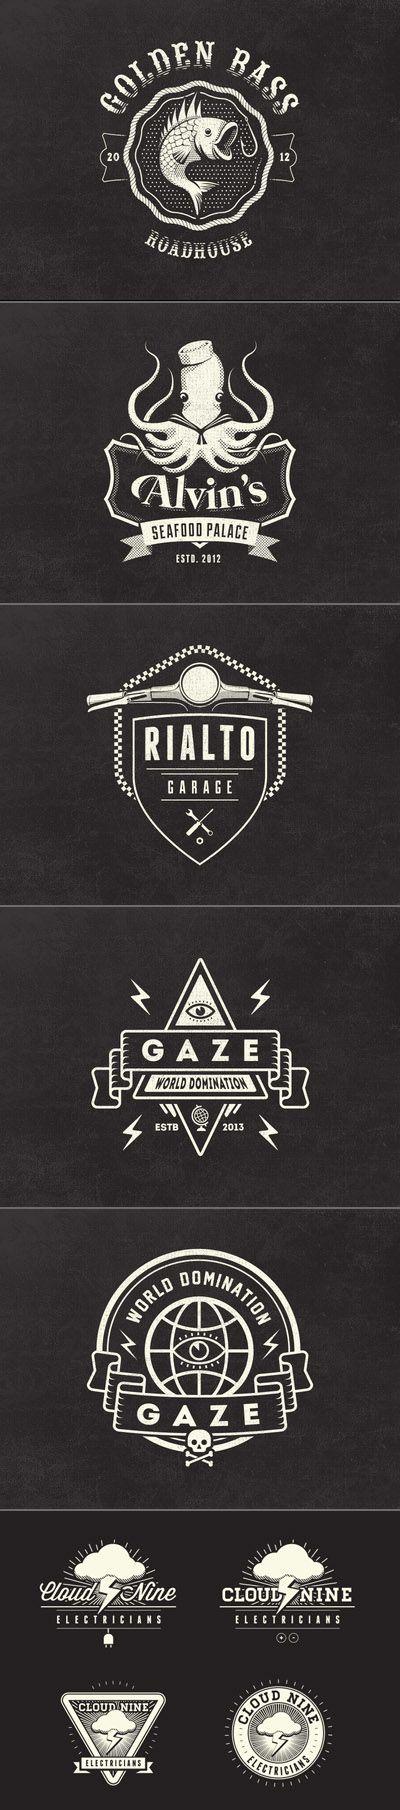 Logos by Mathias Temmen